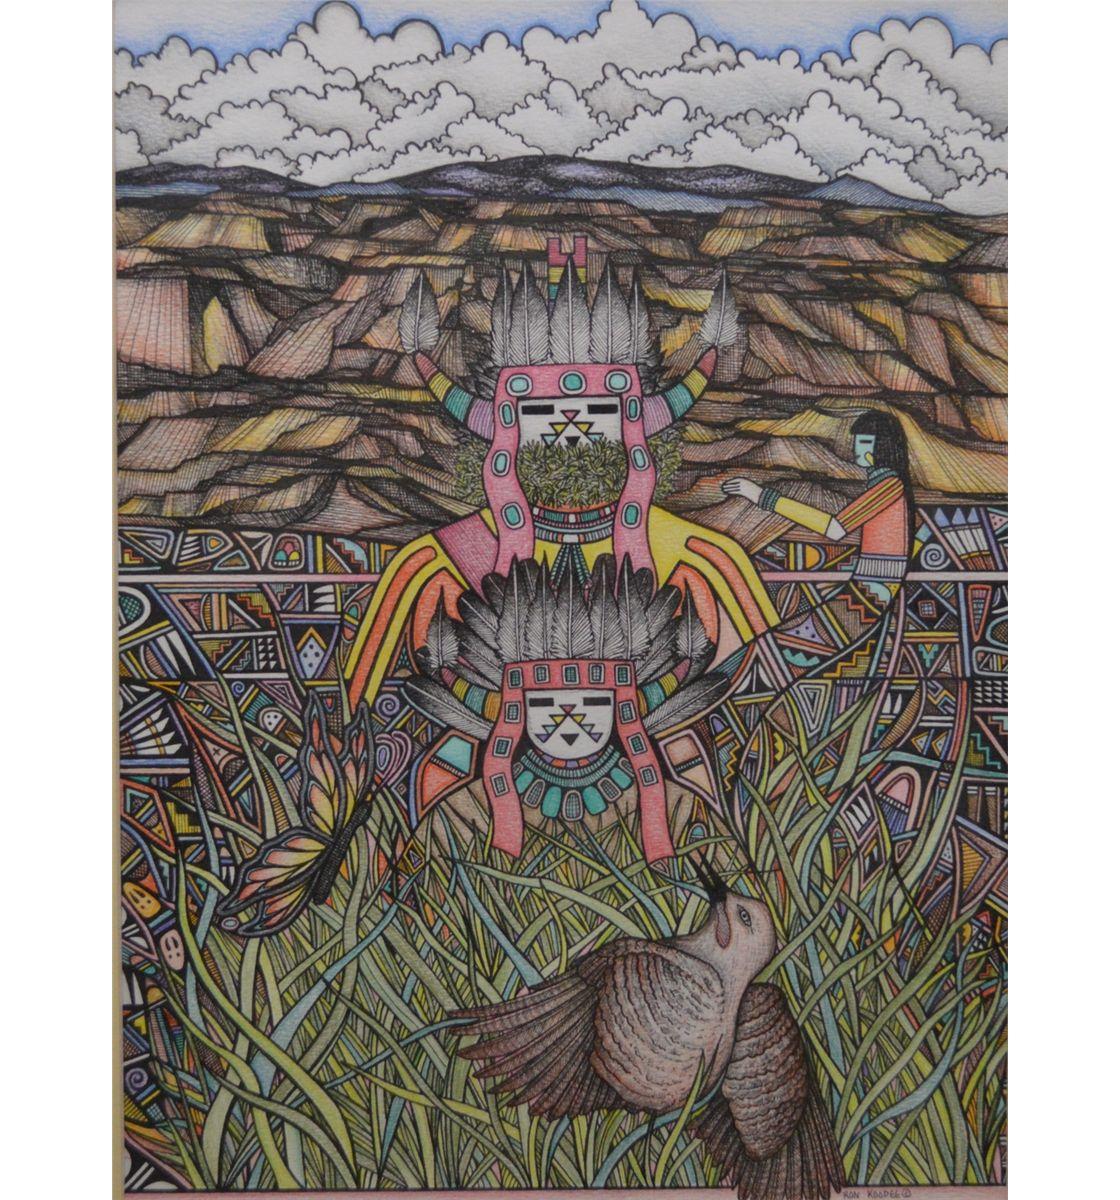 ORIGINAL HOPI DRAWING  Hopi Drawings